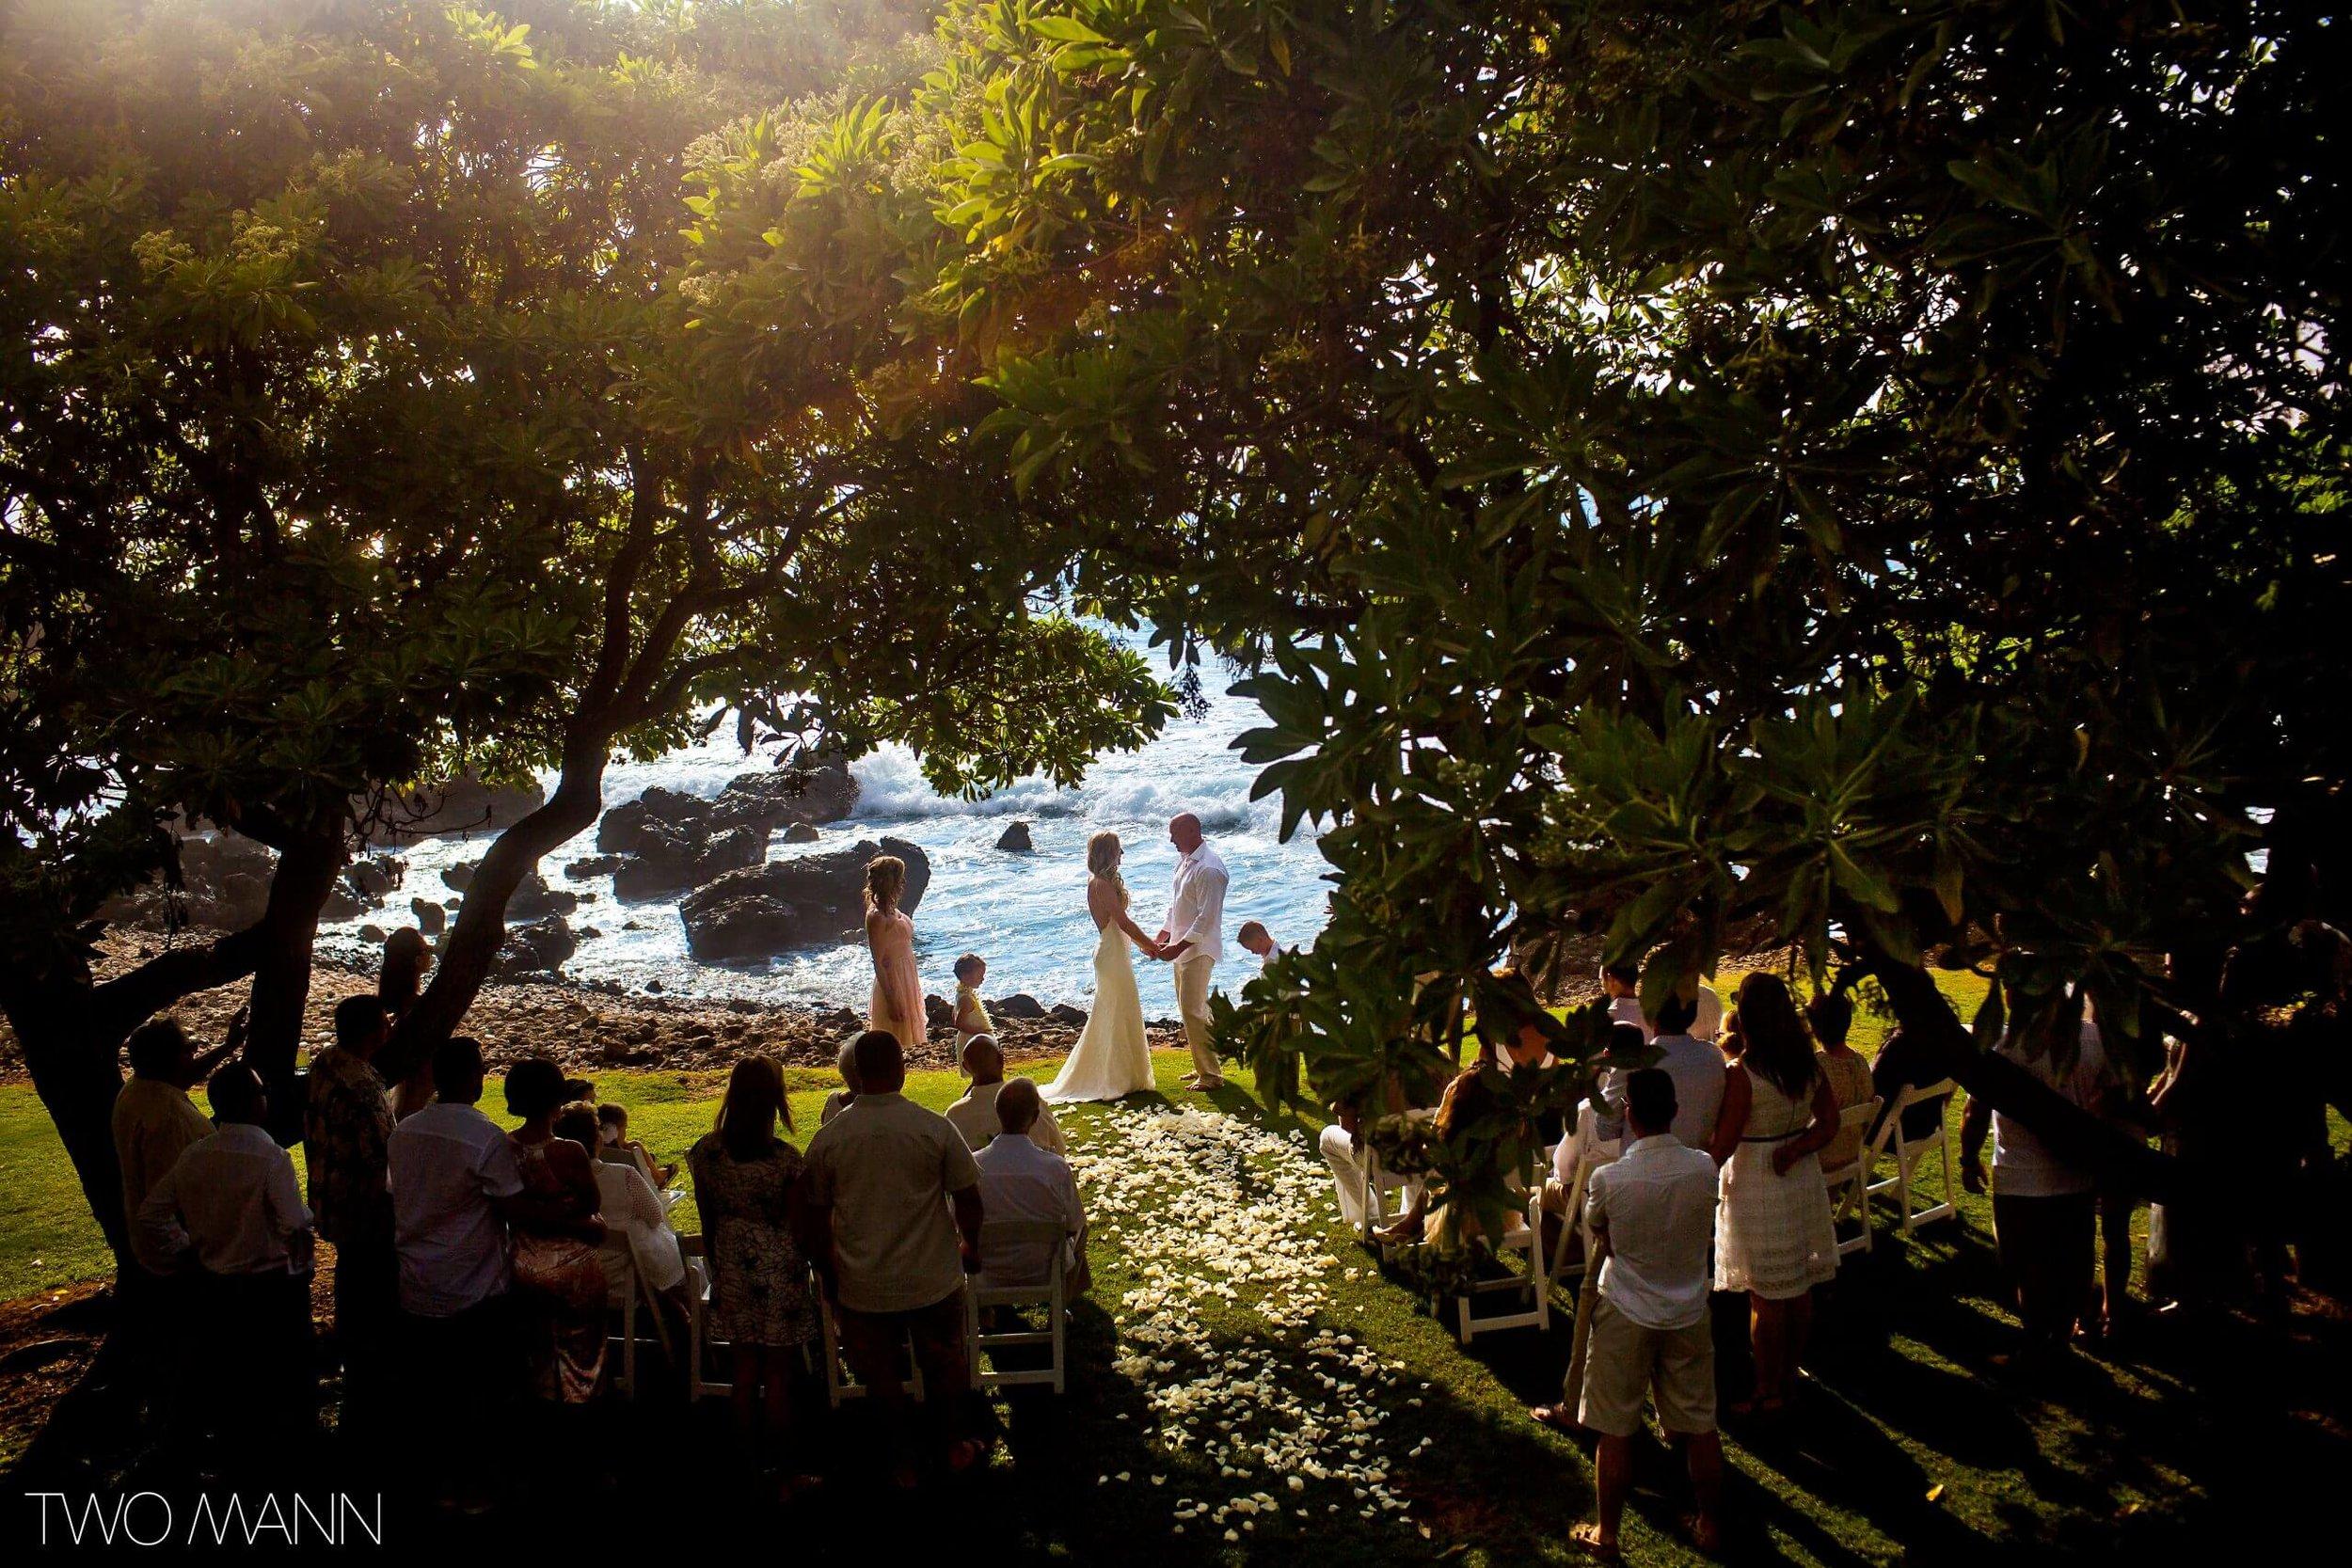 Two-Mann-Studios-Worlds-Best-Wedding-Photography-Best-of-2016-013-2560x1707.jpg